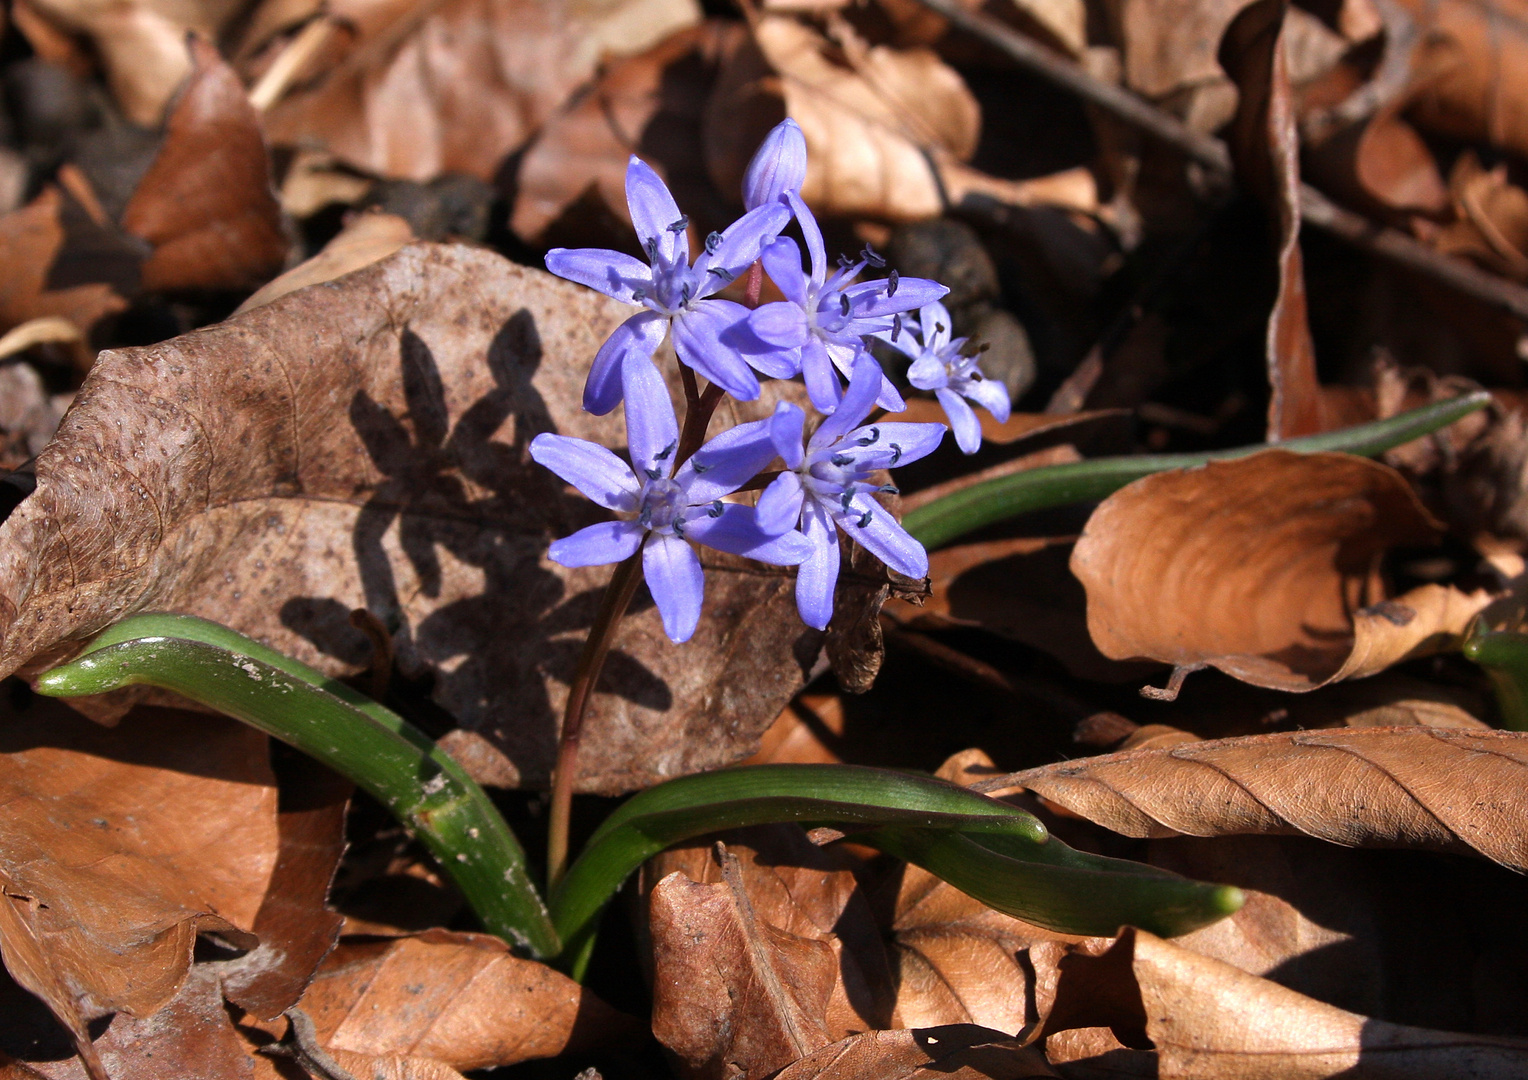 Sehnsucht nach Frühling